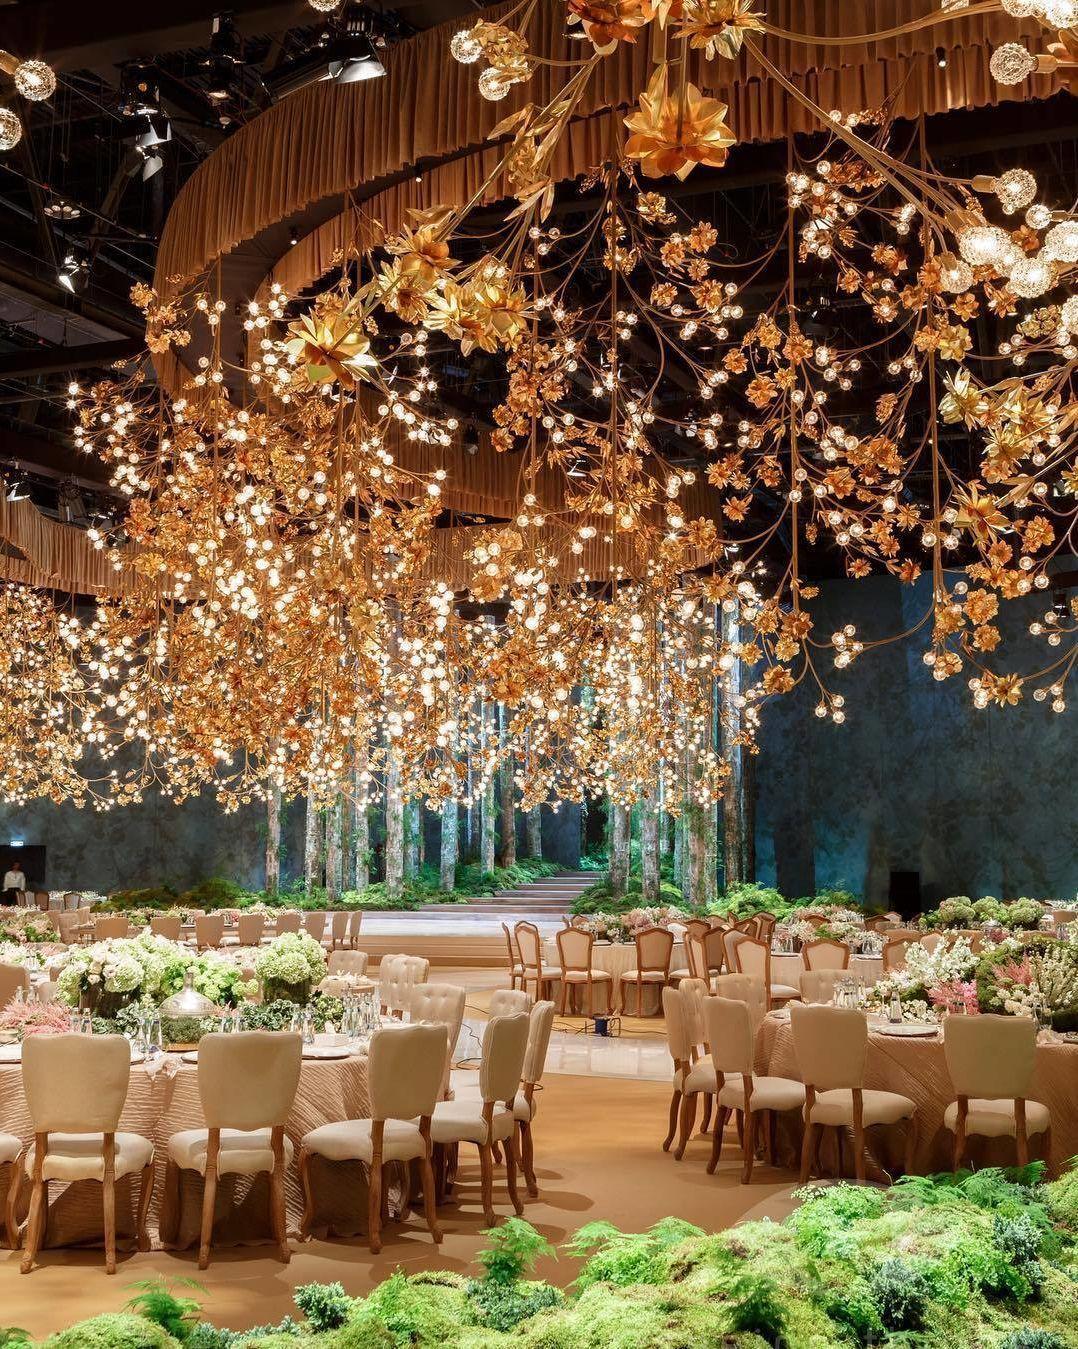 Luxury wedding decoration ideas   Likes  Comments  u Luxury Wedding Pages u weddingges on